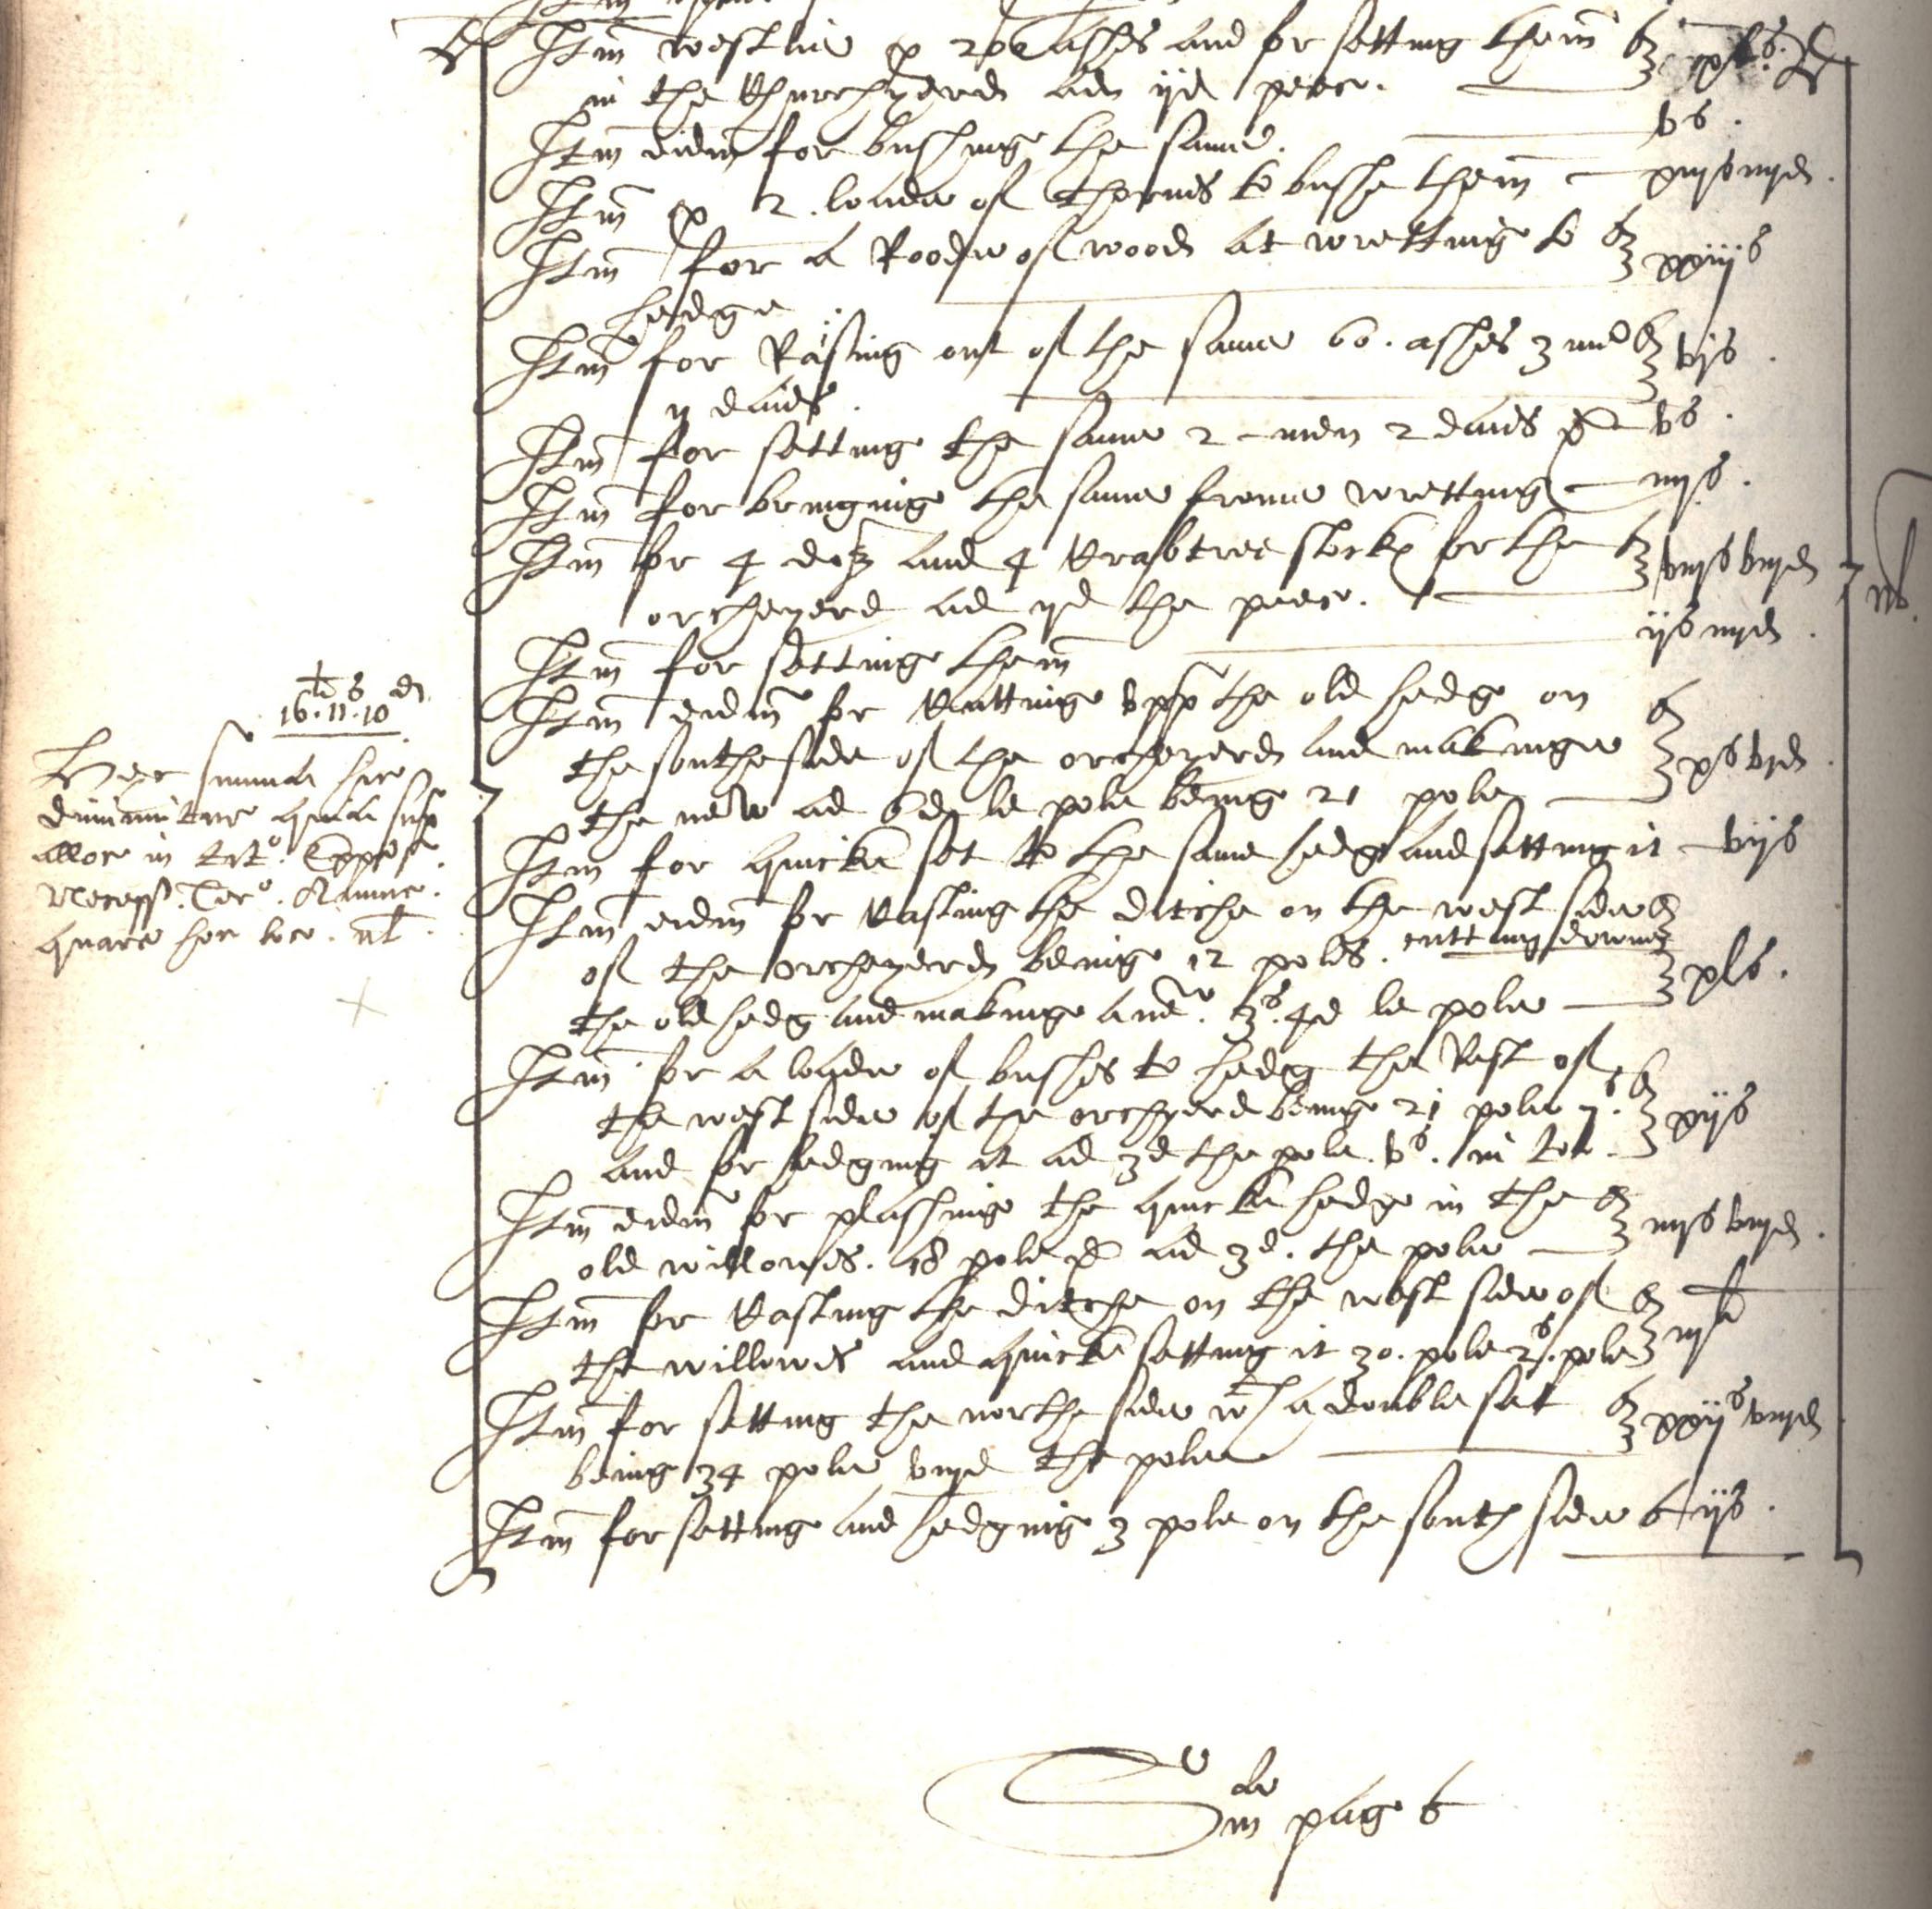 Mundum book entry, 1580.